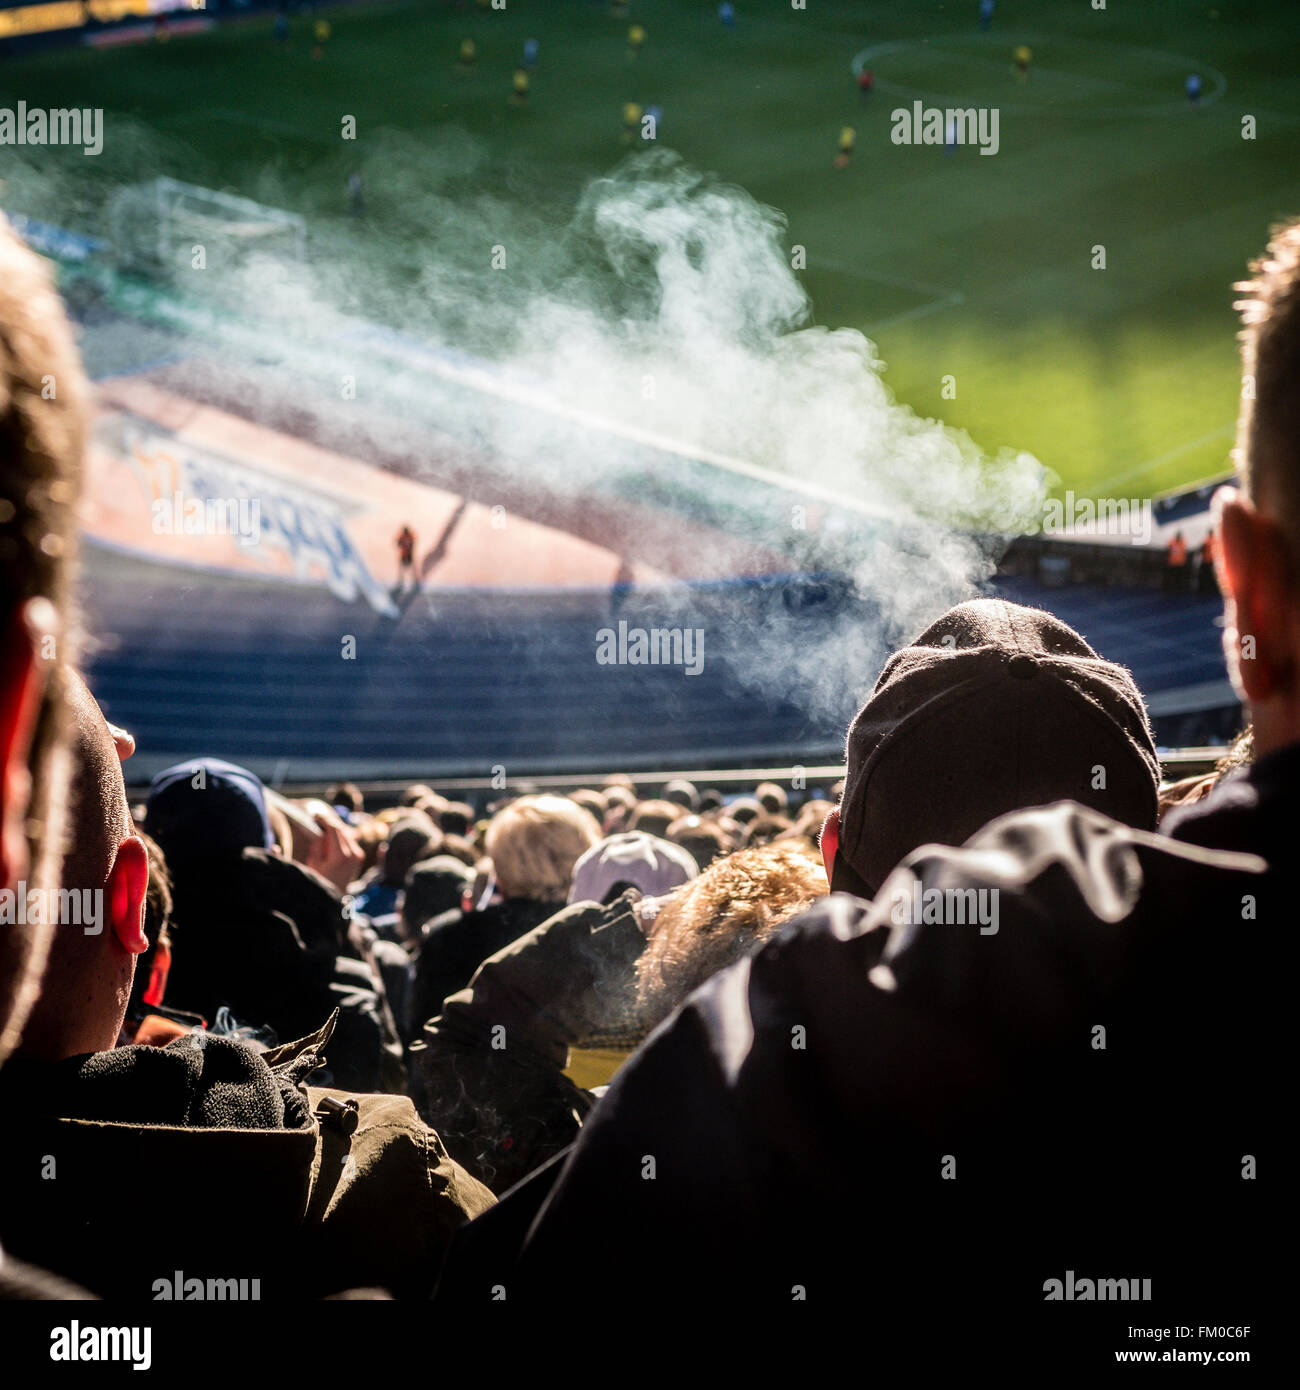 Football Fans Smoking inside the Olympiastadion Berlin, Germany - Feb 2016 - Stock Image